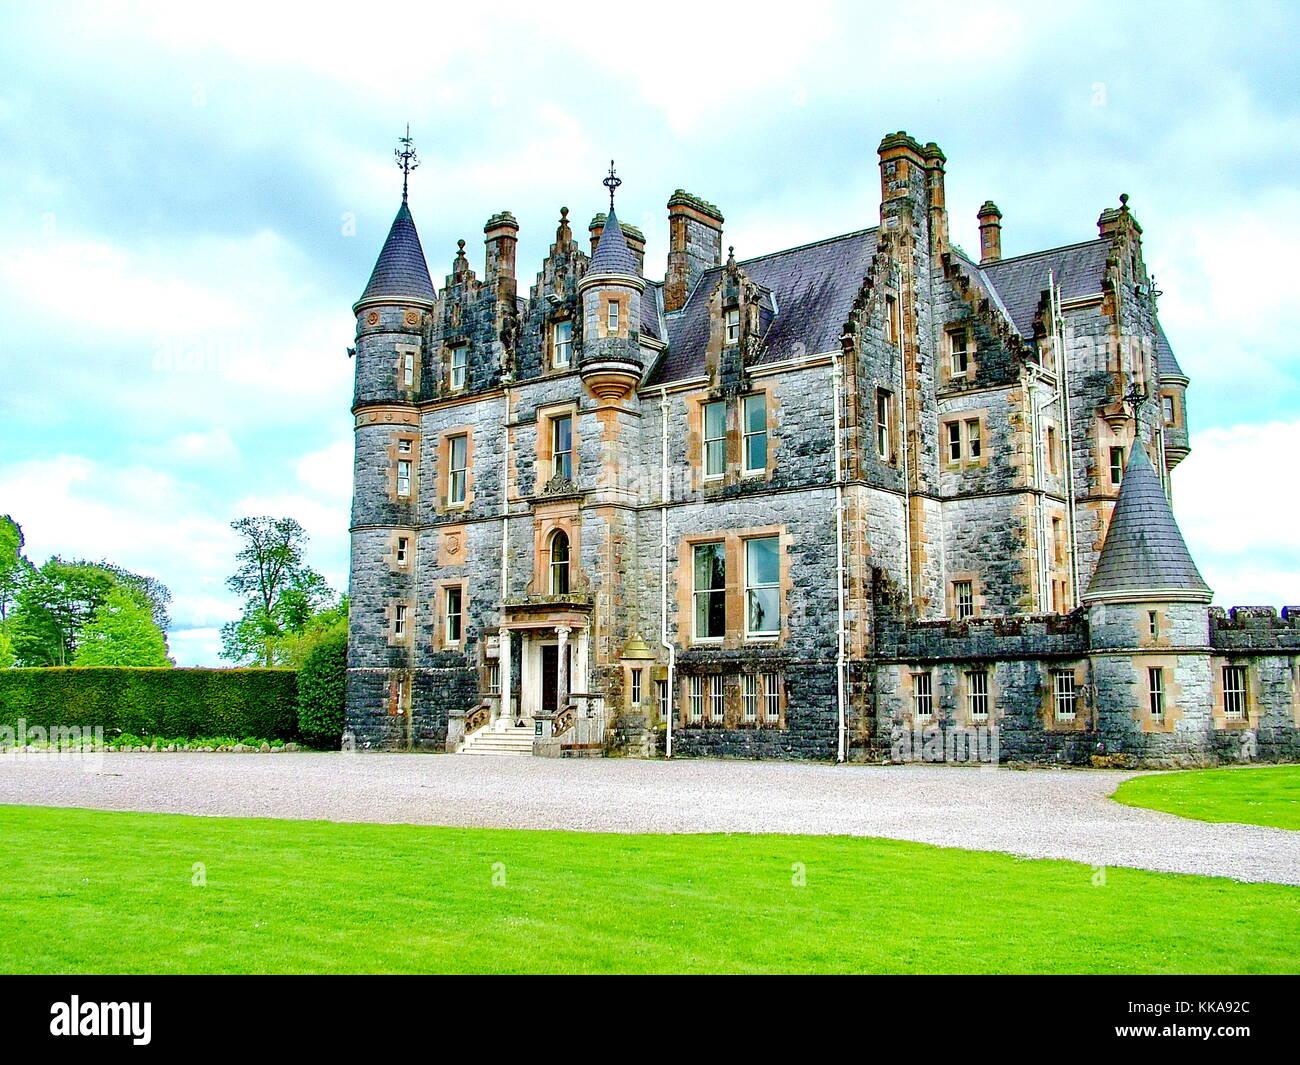 Blarney House in der Nähe von Blarney Castle, Co Cork, Irland Stockbild